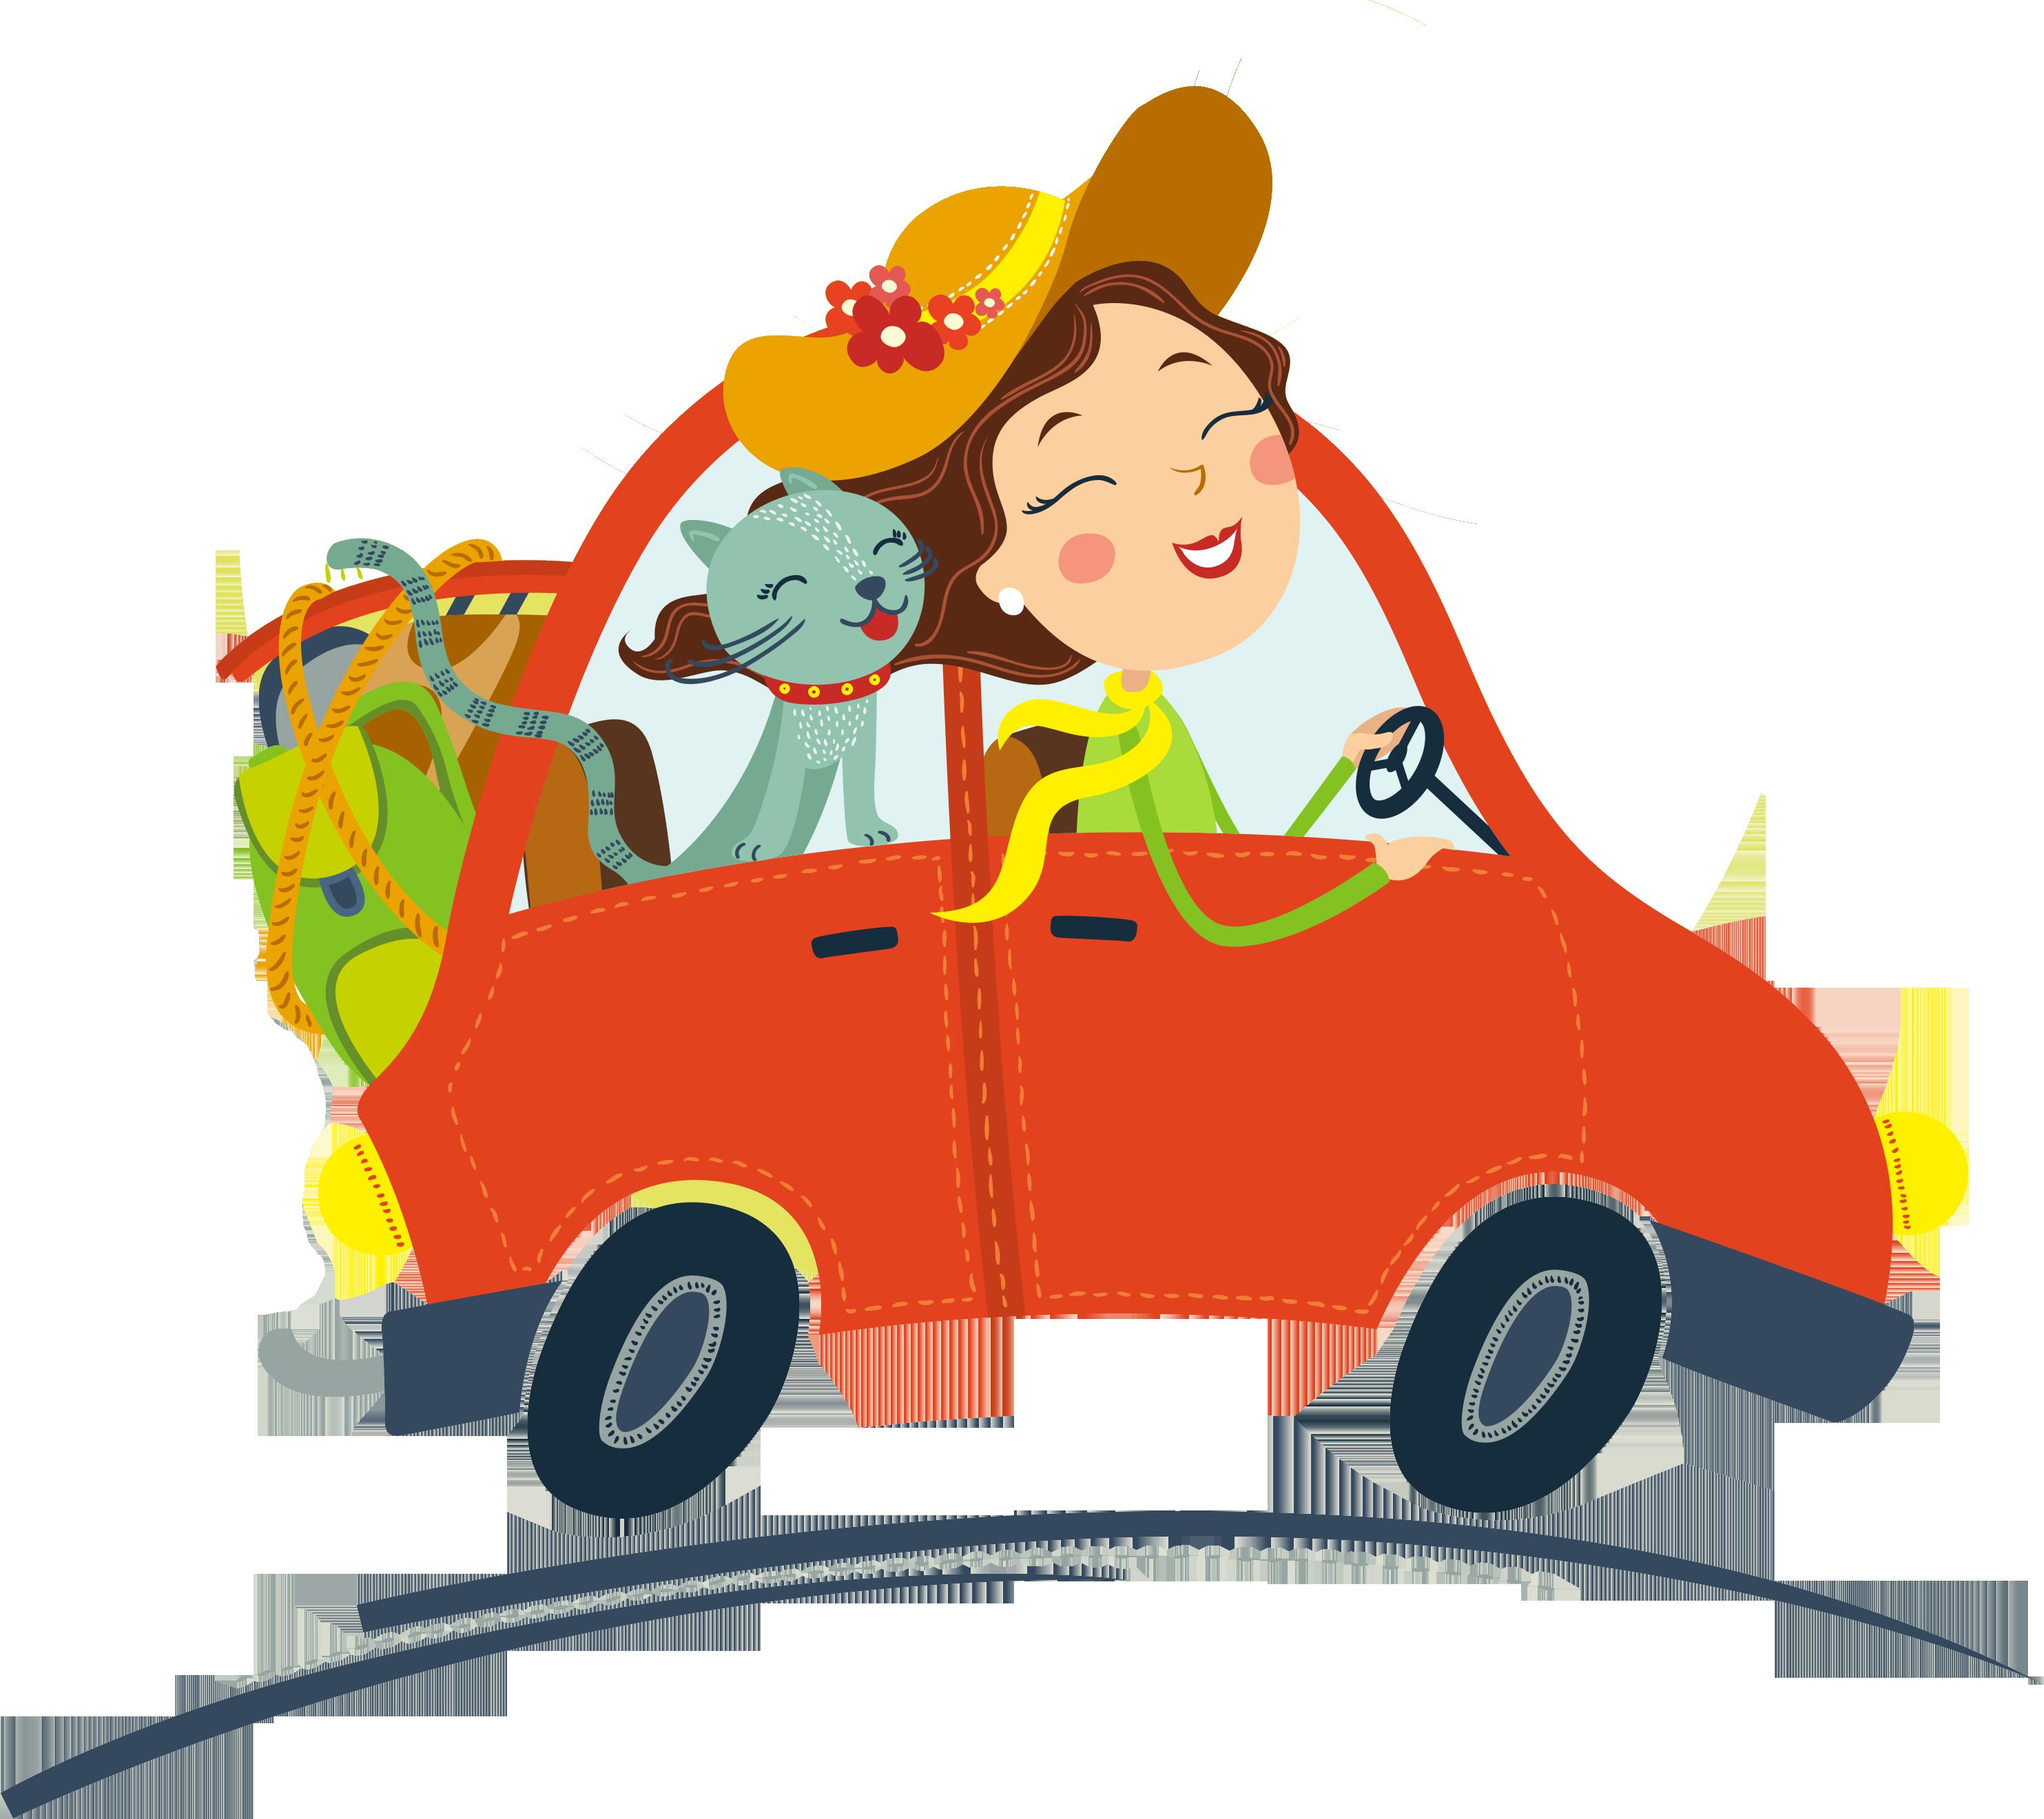 Driving clipart orange car, Driving orange car Transparent ... (2967 x 2641 Pixel)